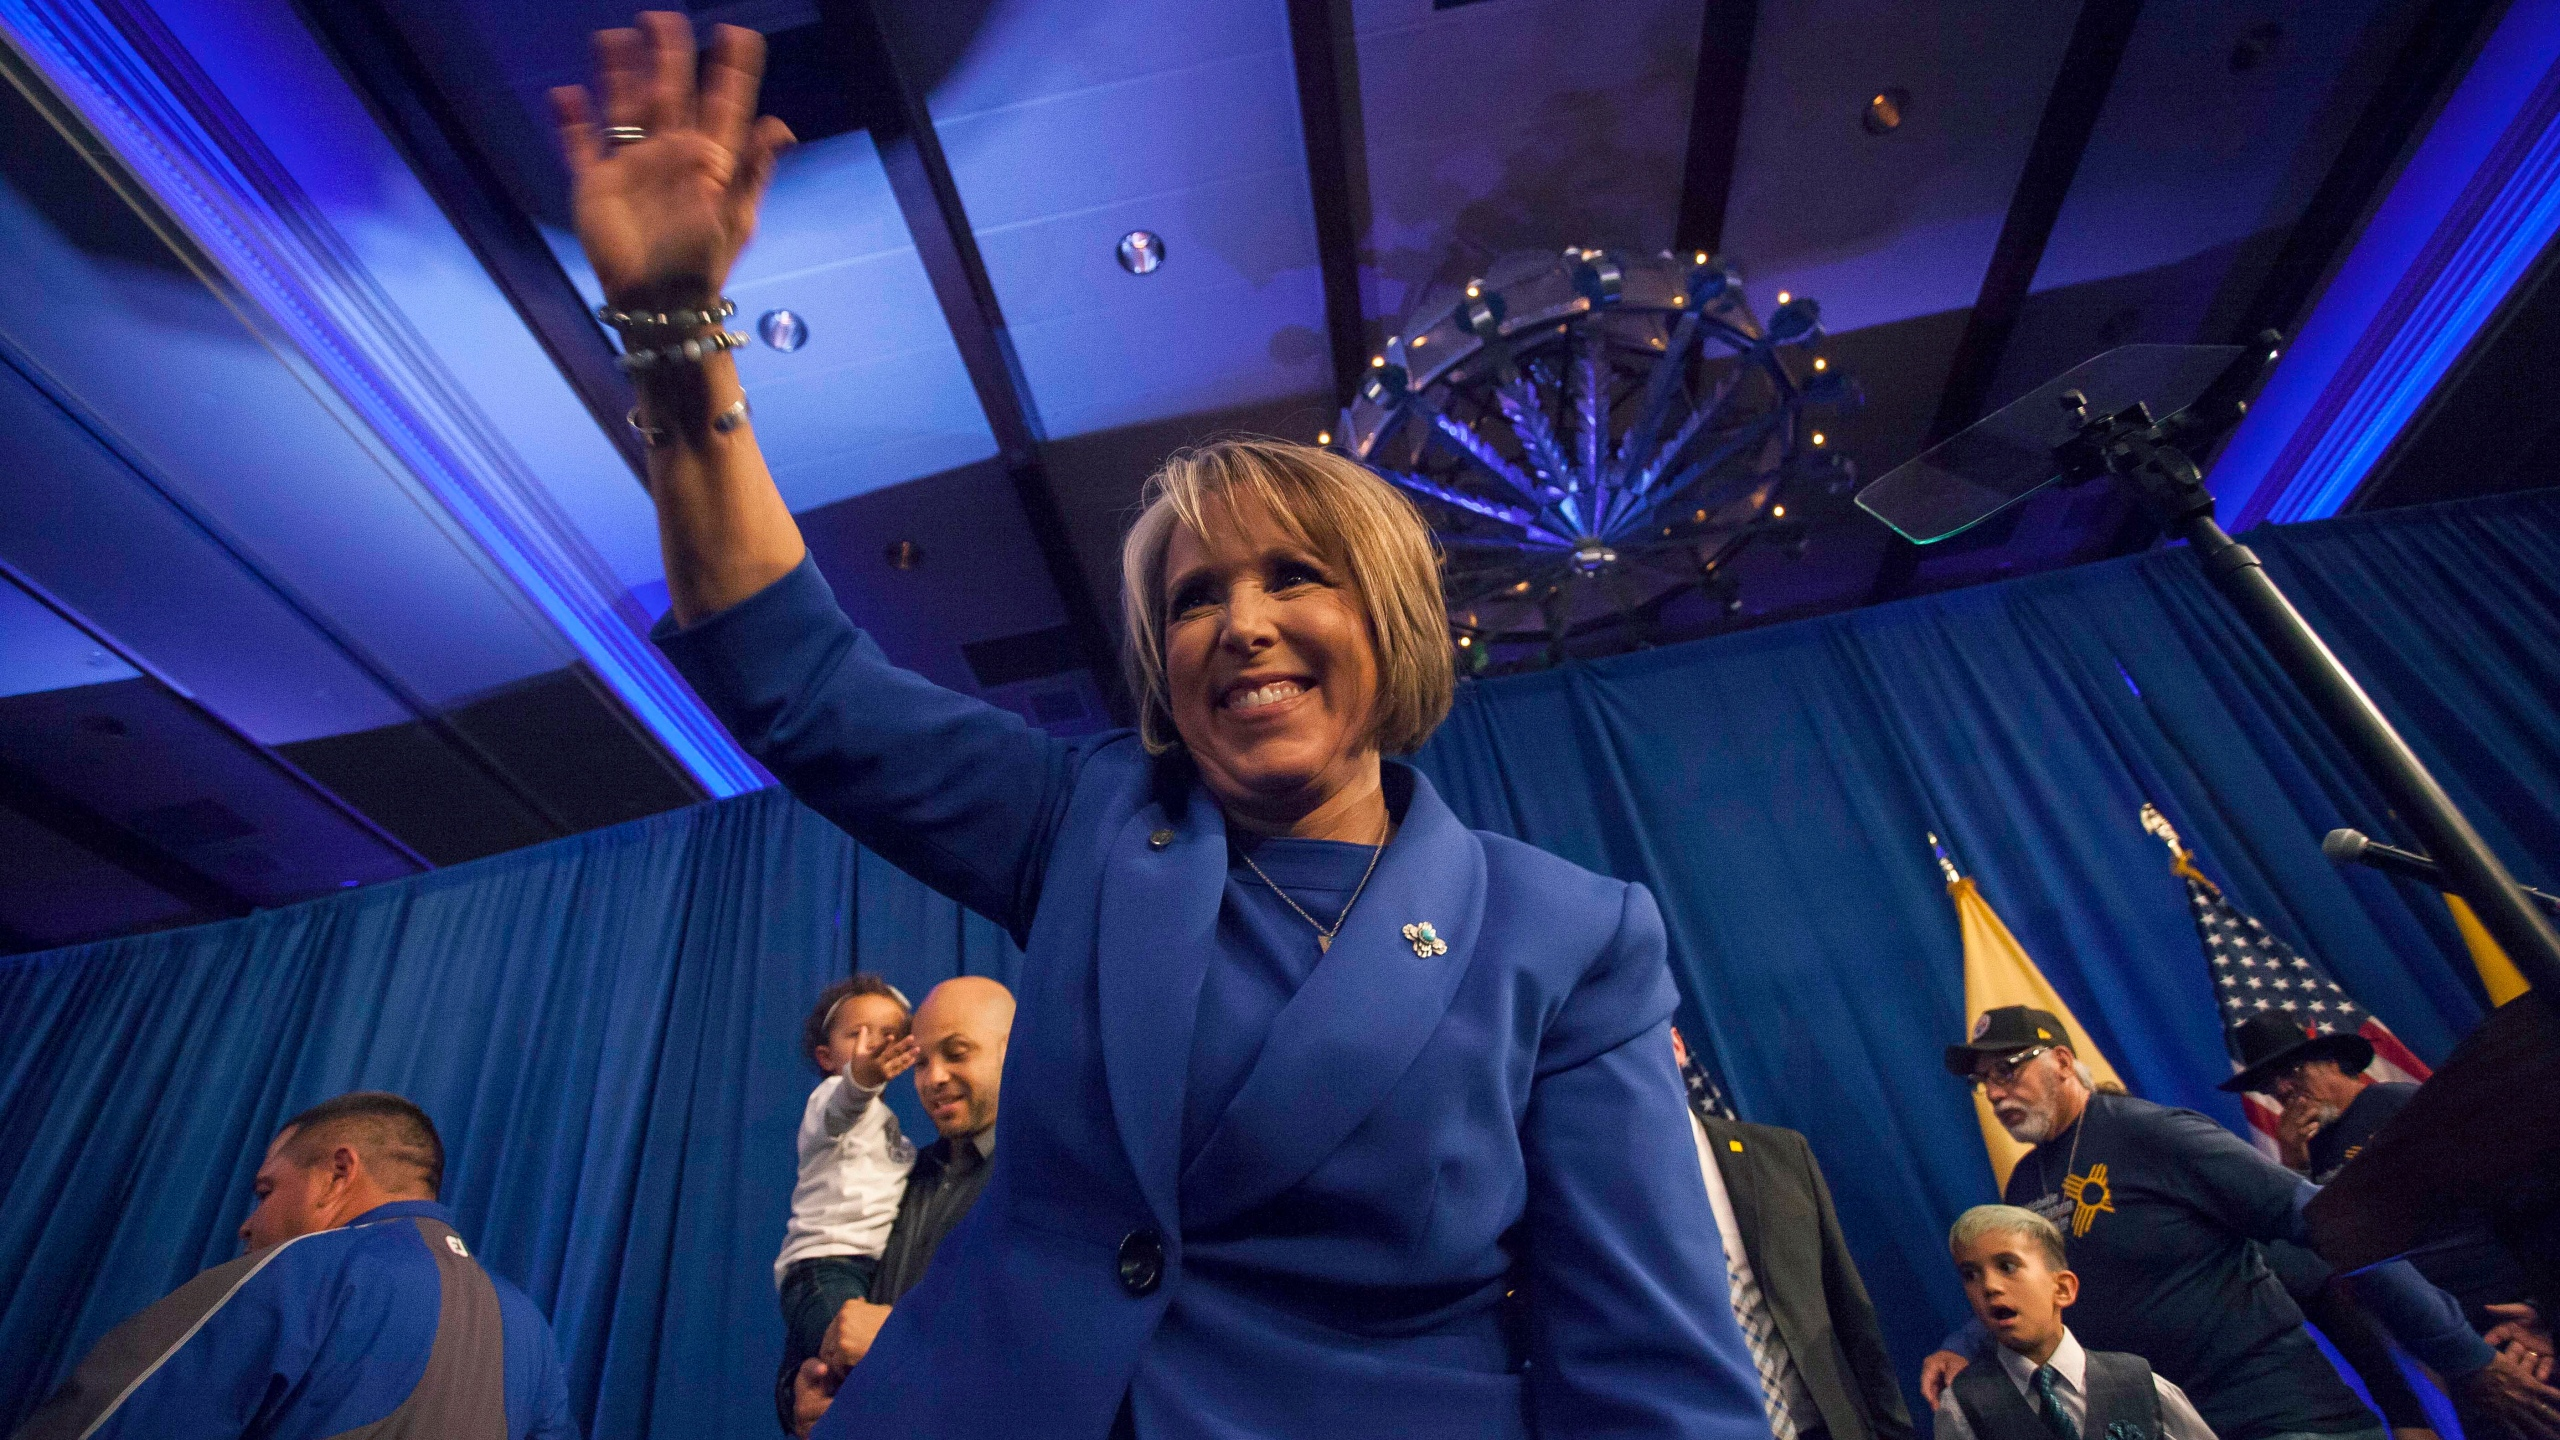 Election_2018_Governor_Lujan-Grisham_New_Mexico_96803-159532.jpg84483875